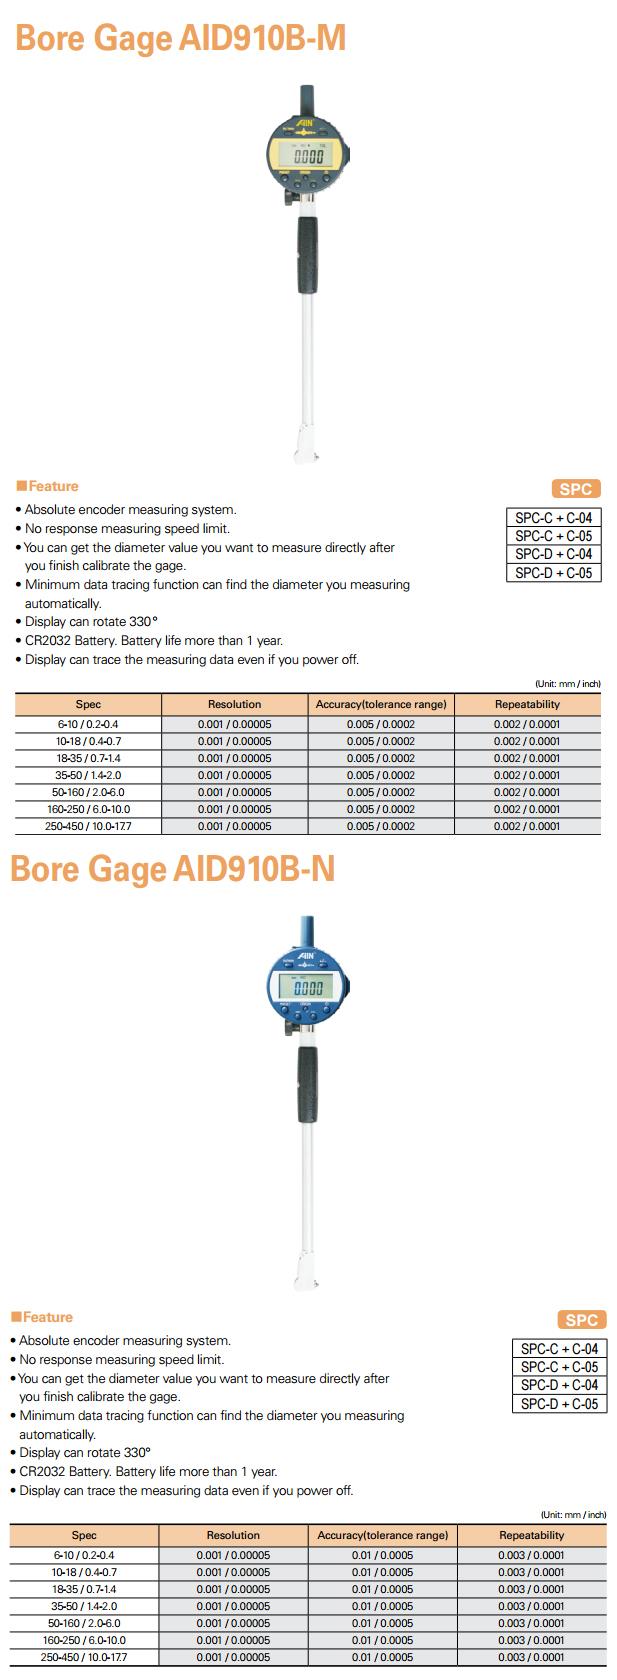 AIN Bore Gage AID910B-M/B-N, AID920B-M/B-N